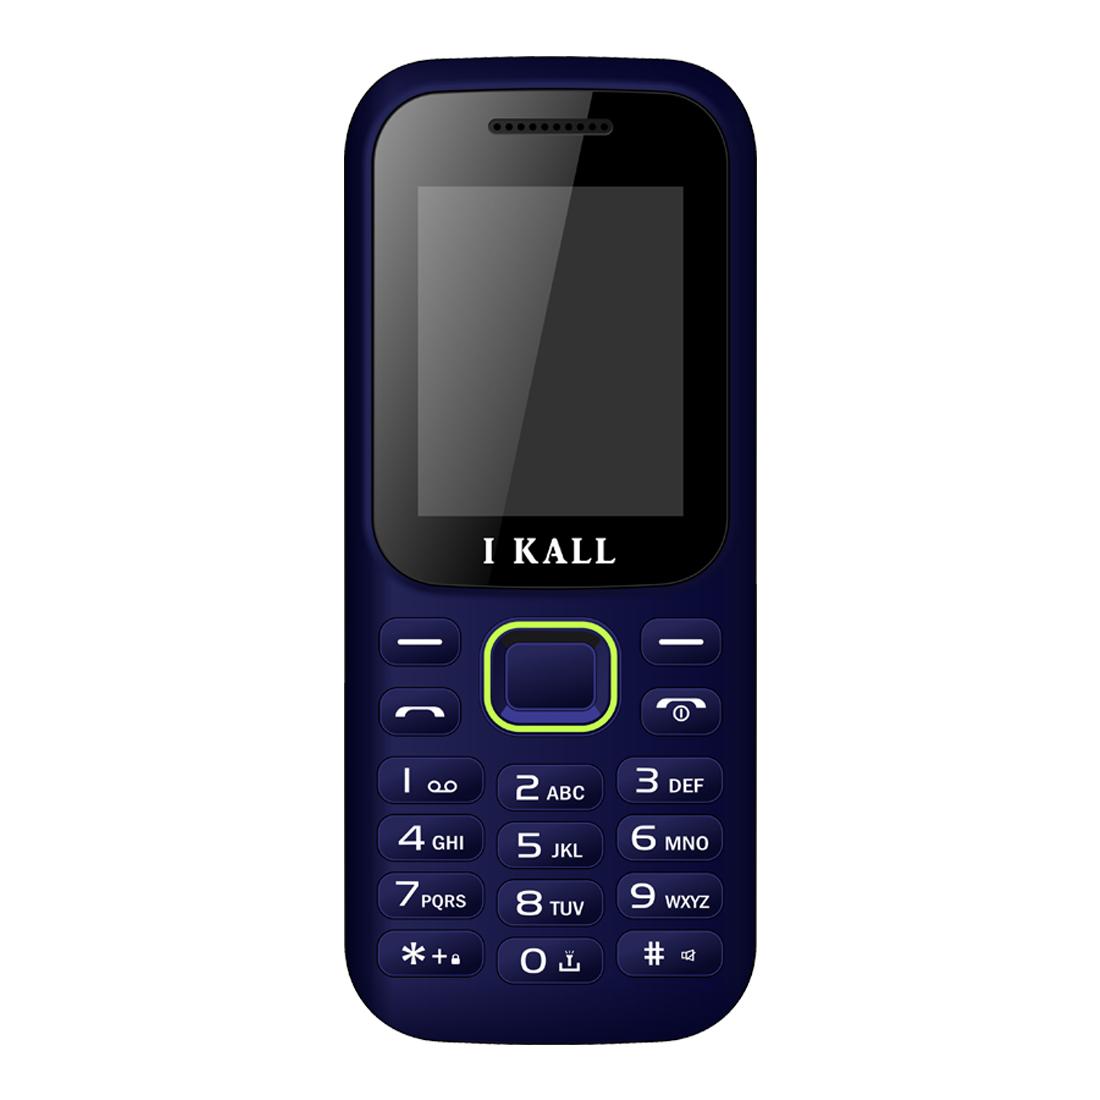 I Kall K31 1.8 inch Dual Sim Feature Phone